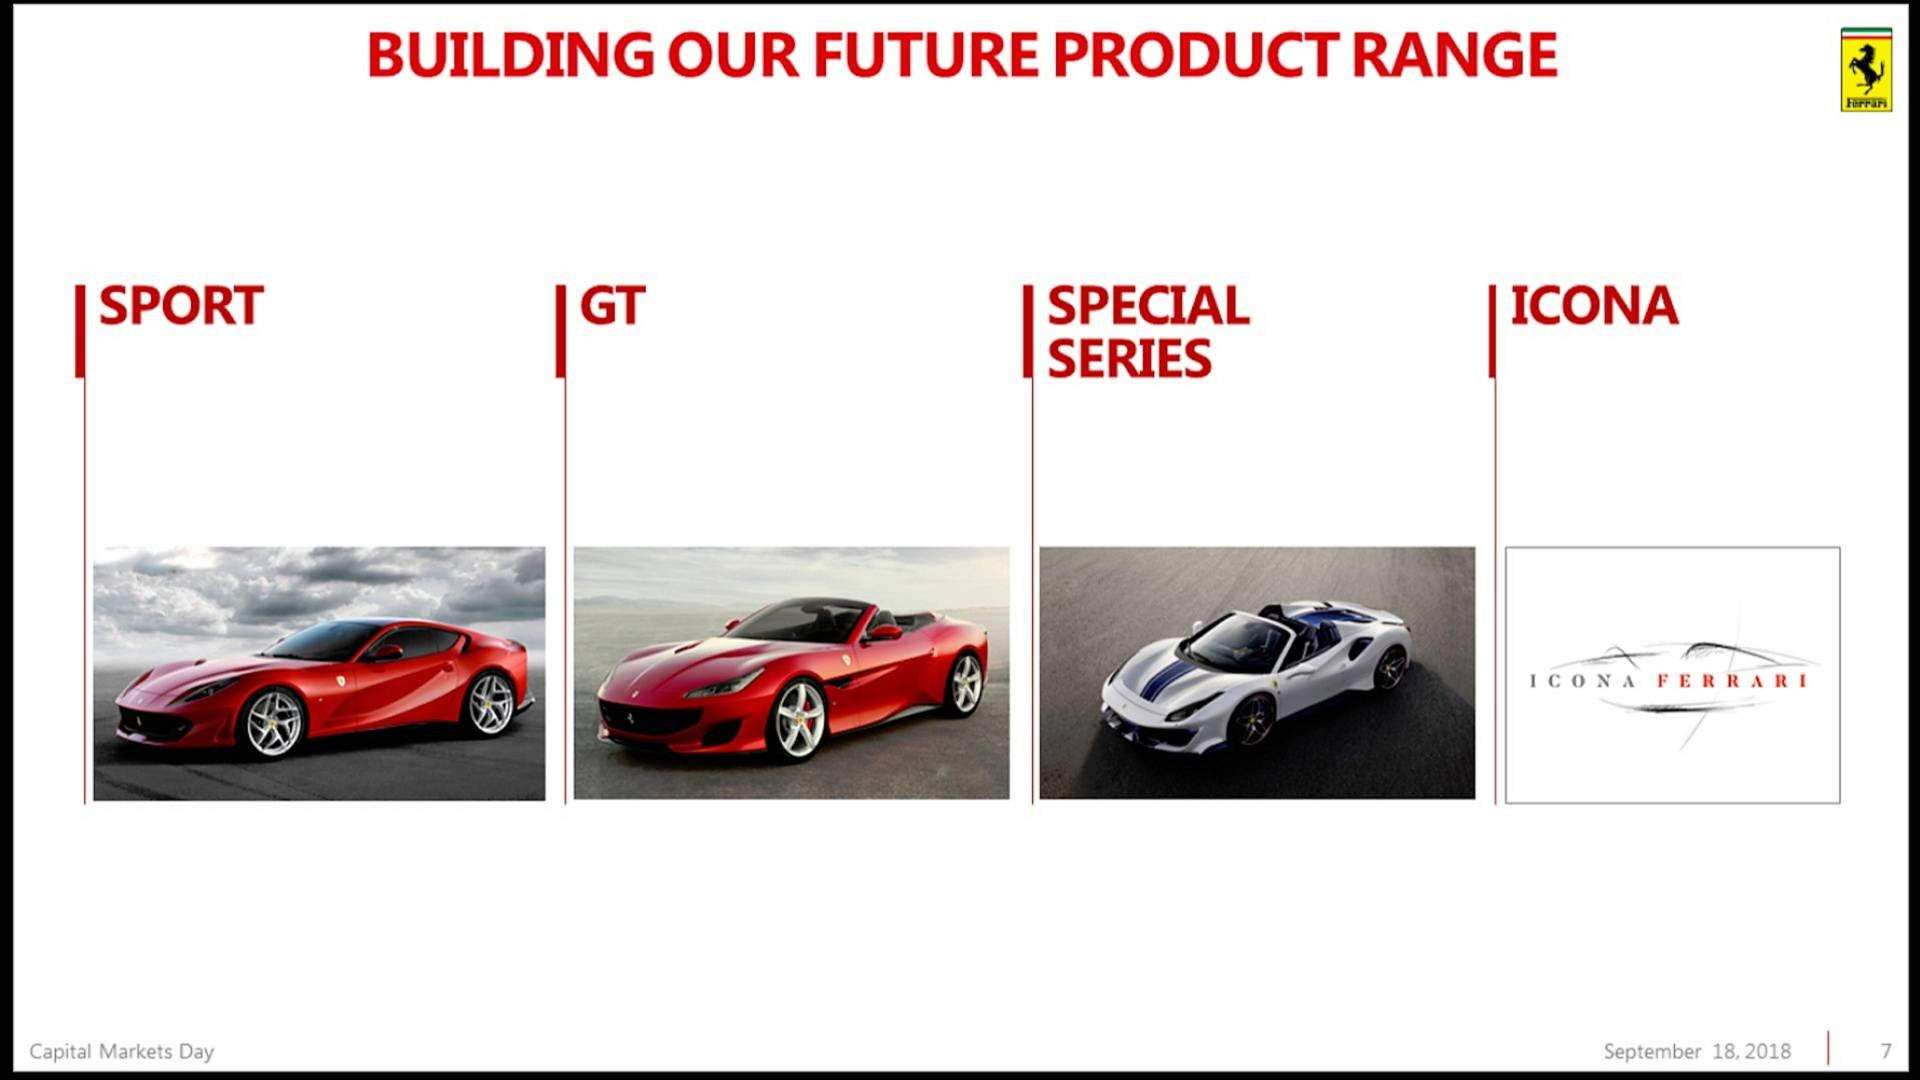 Ferrari Reveals 2018-2022 Roadmap With More Hybrid Models